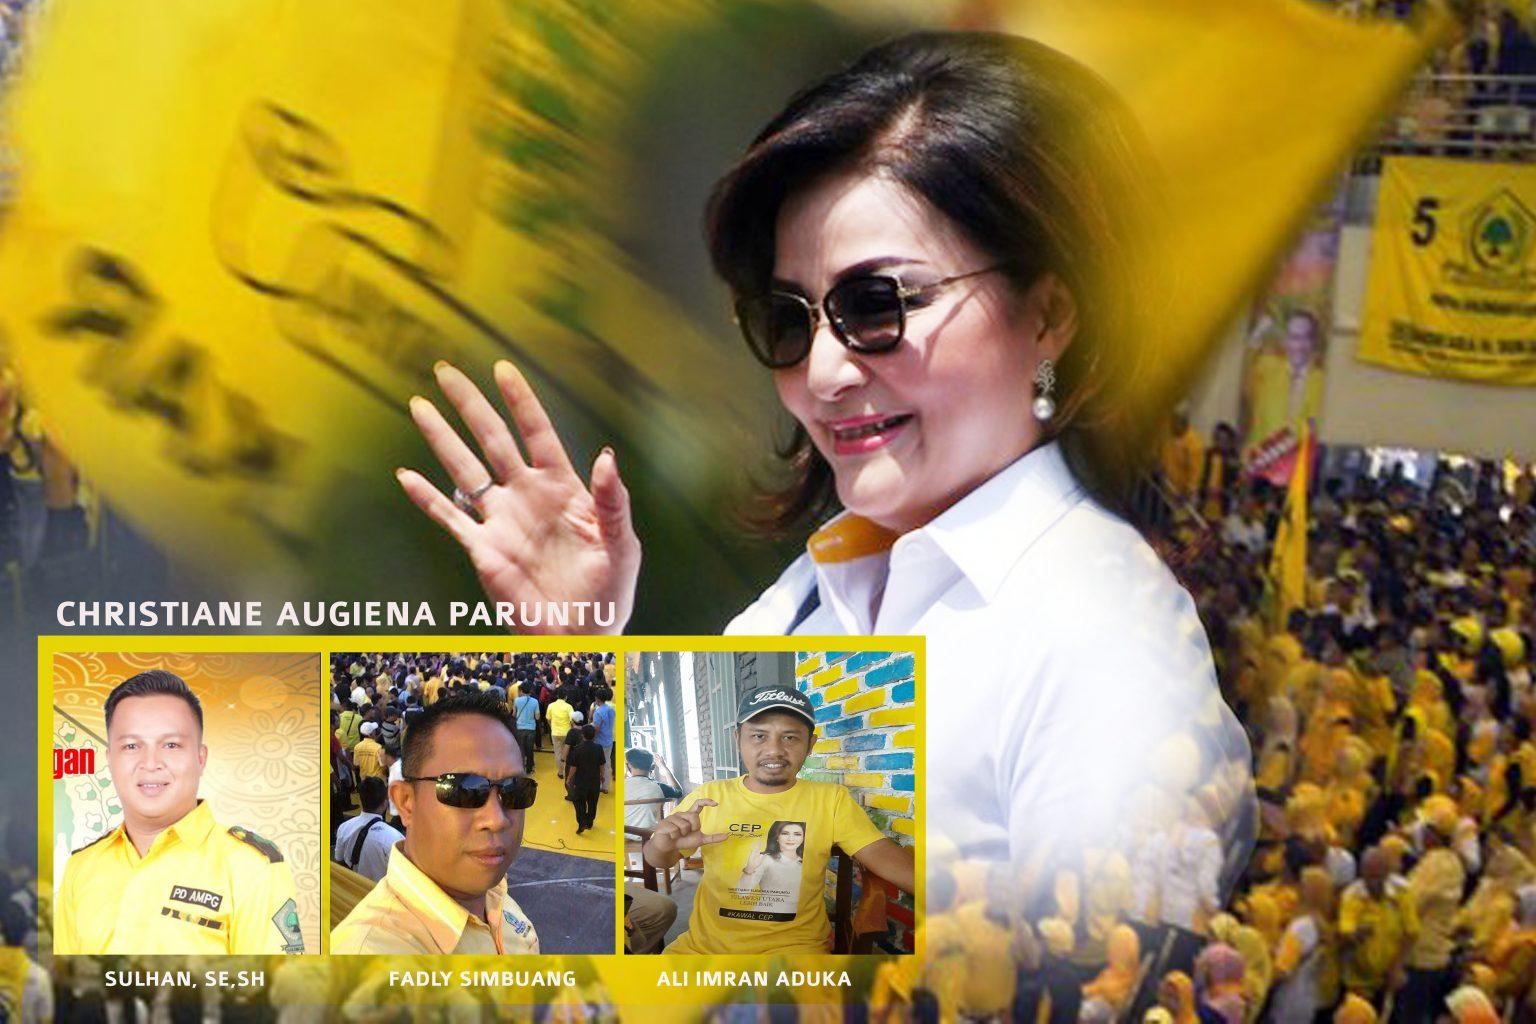 Amankan SK DPP Terkait PAW Wakil Ketua DPRD, 3 Kader Bolmong Terancam Dipecat